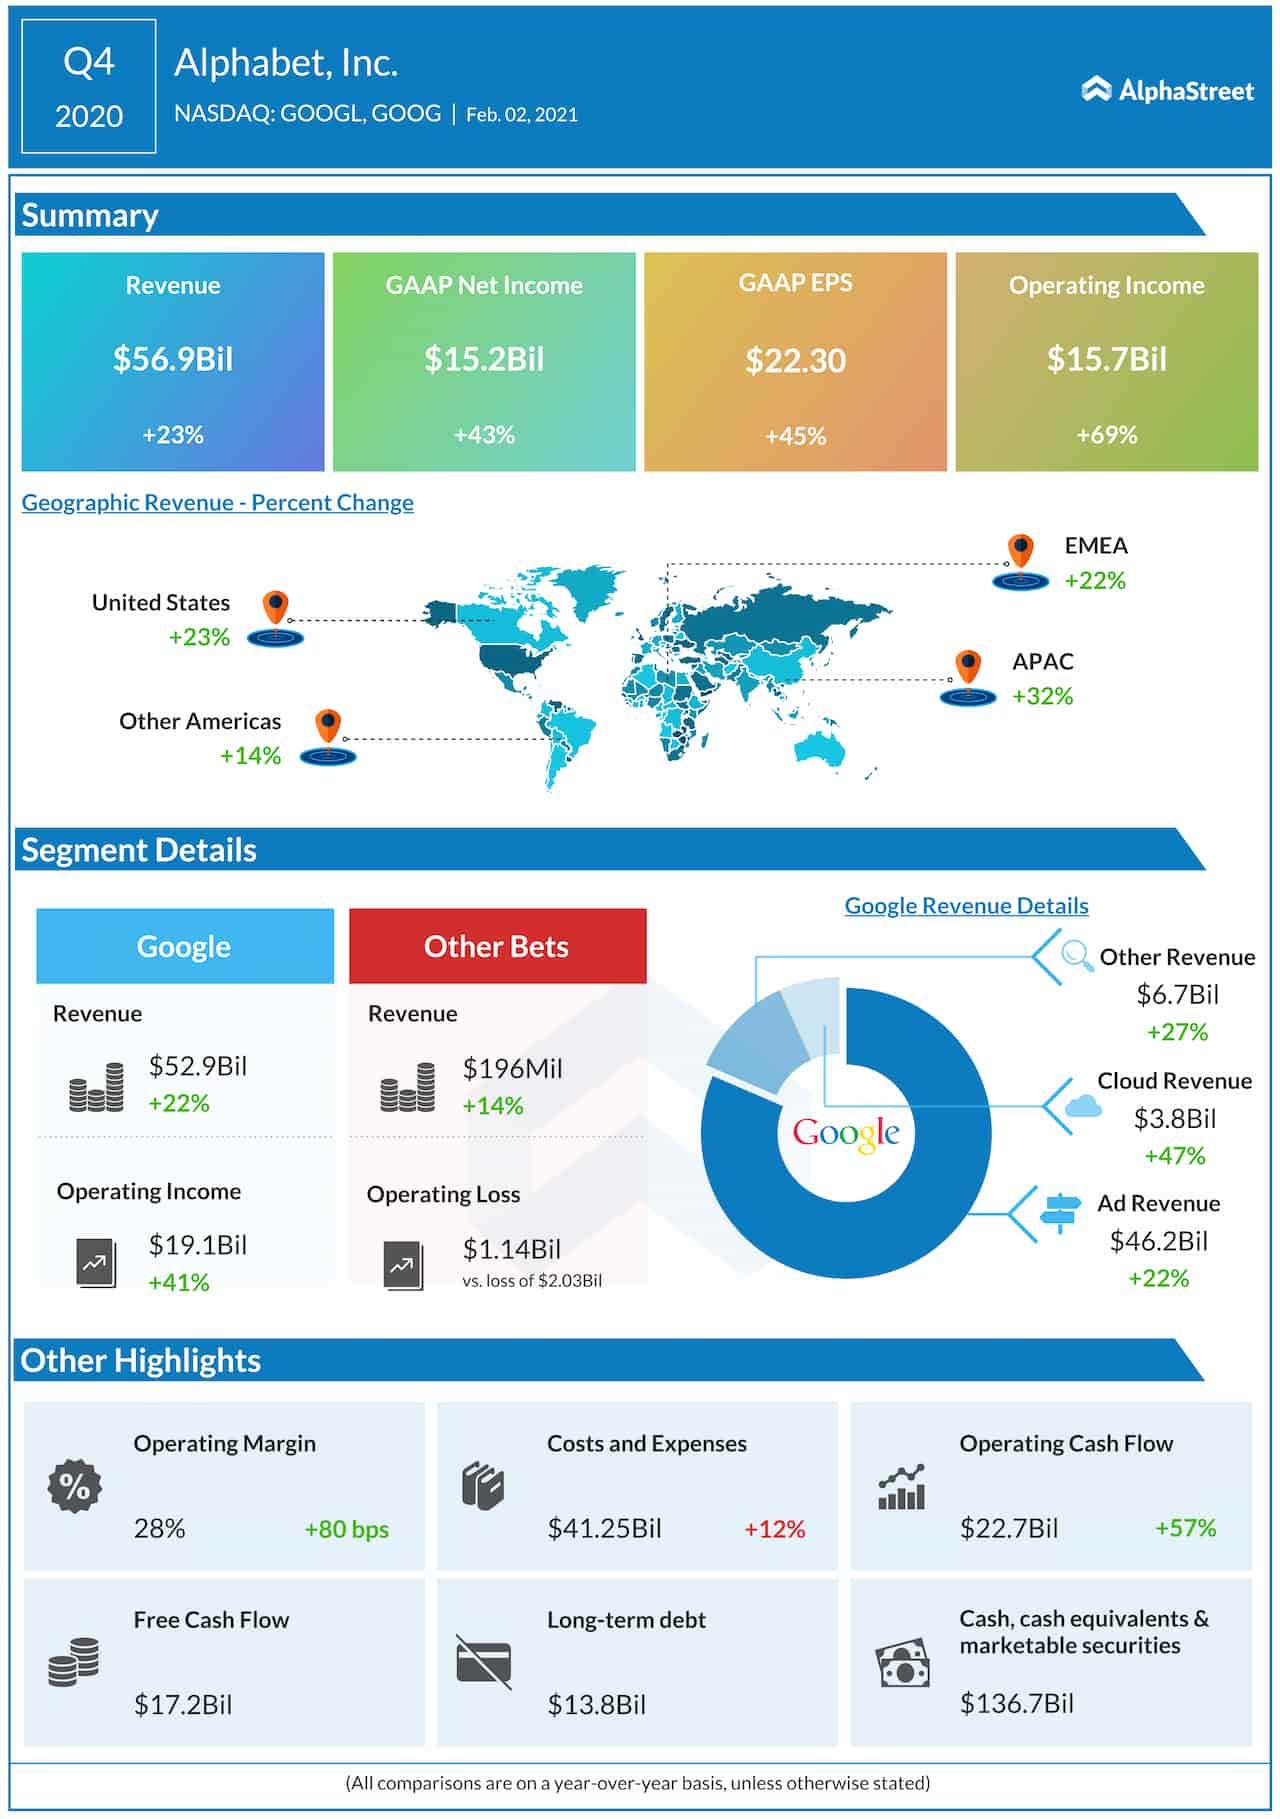 Alphabet Q4 2020 earnings infographic